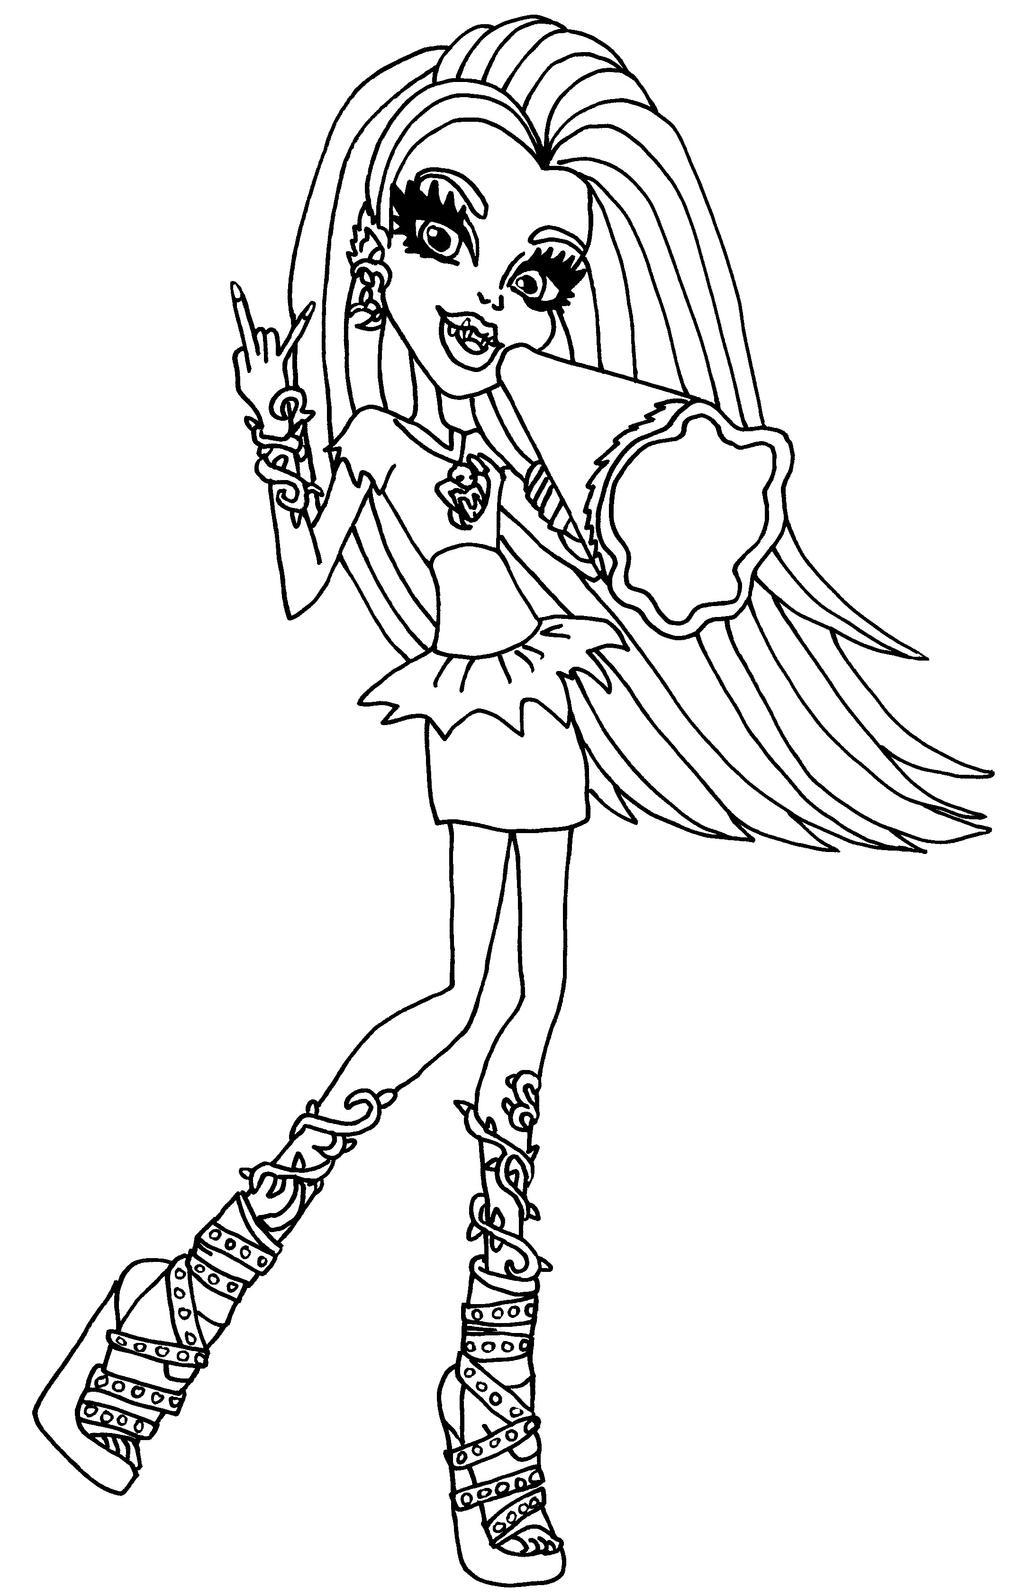 Ghoul Spirit Venus By Elfkena On Deviantart Venus Mcflytrap Coloring Pages